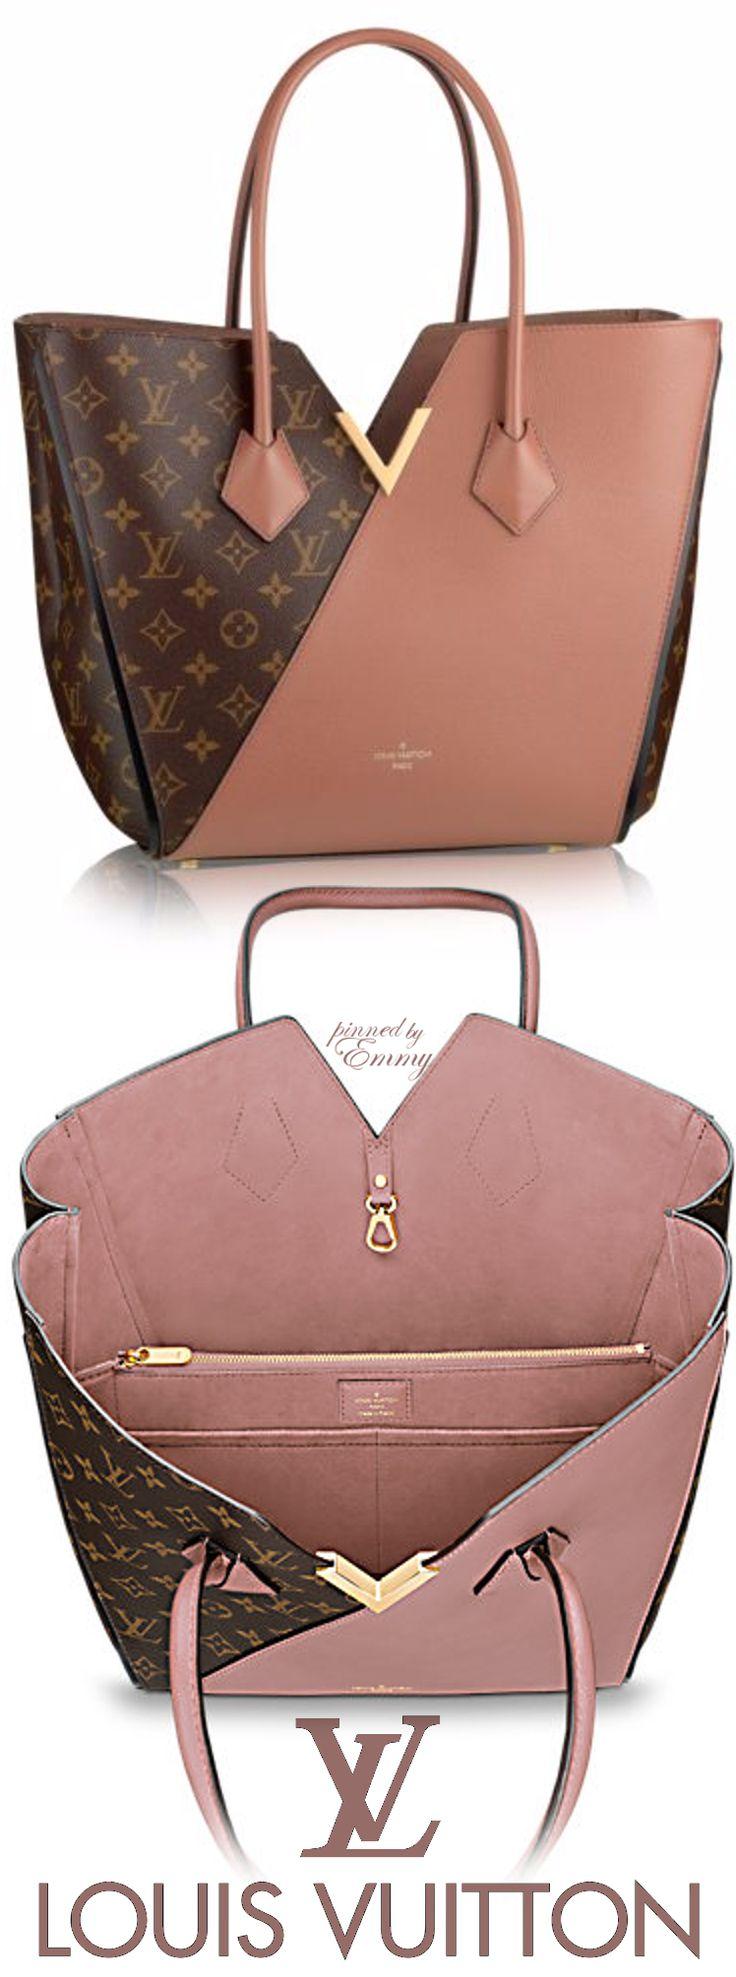 Louis Vuitton 'Kimono' #bag #pink